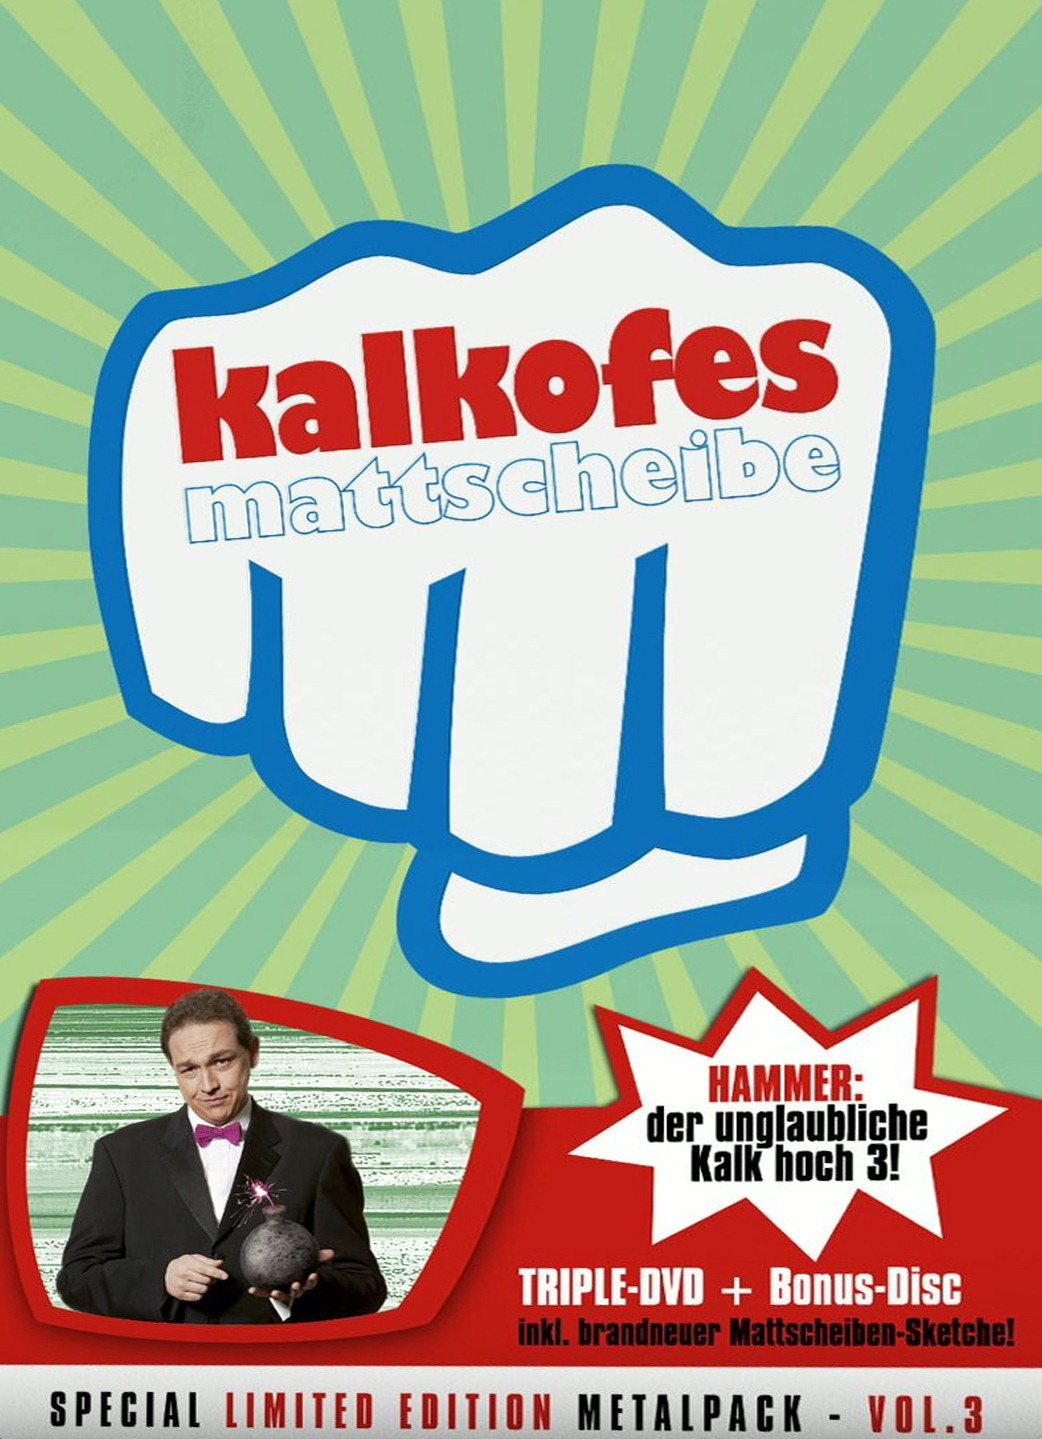 Kalkofes Mattscheibe Vol. 3 (Special Limited Edition, 4 DVDs, Metalpack) Poster